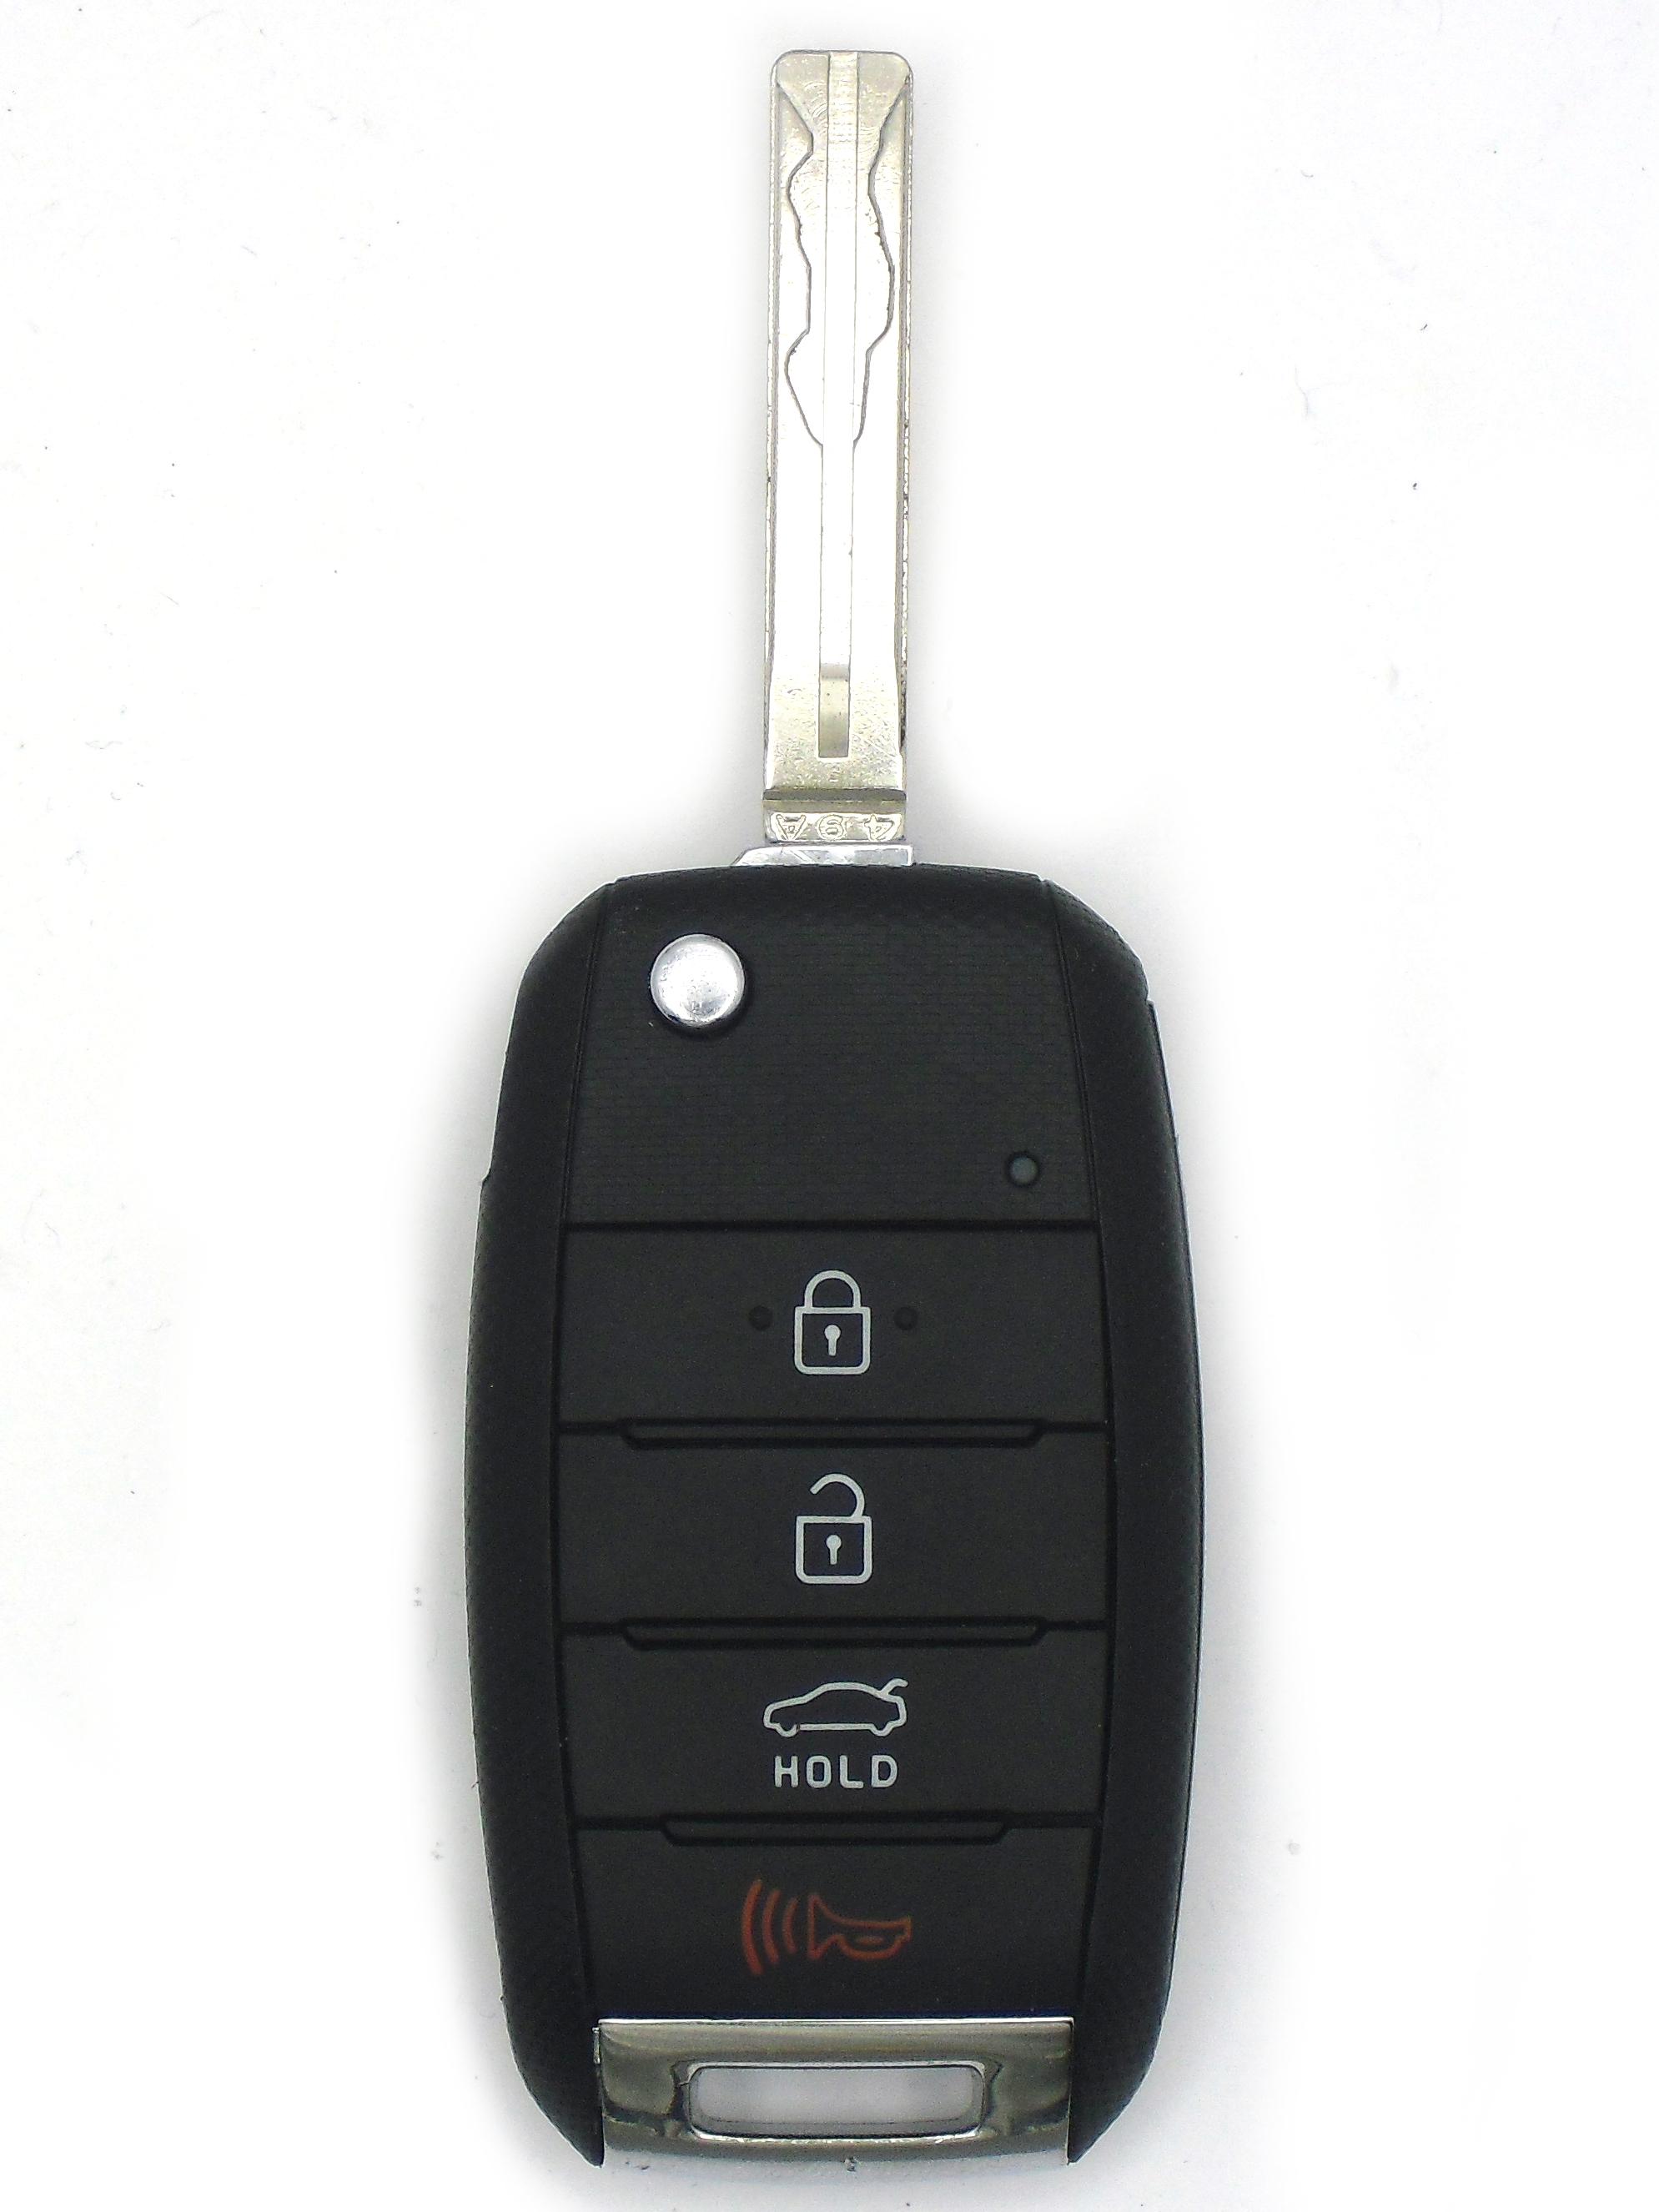 Kia Keyless Entry and Flip Key - 4 Button with Trunk